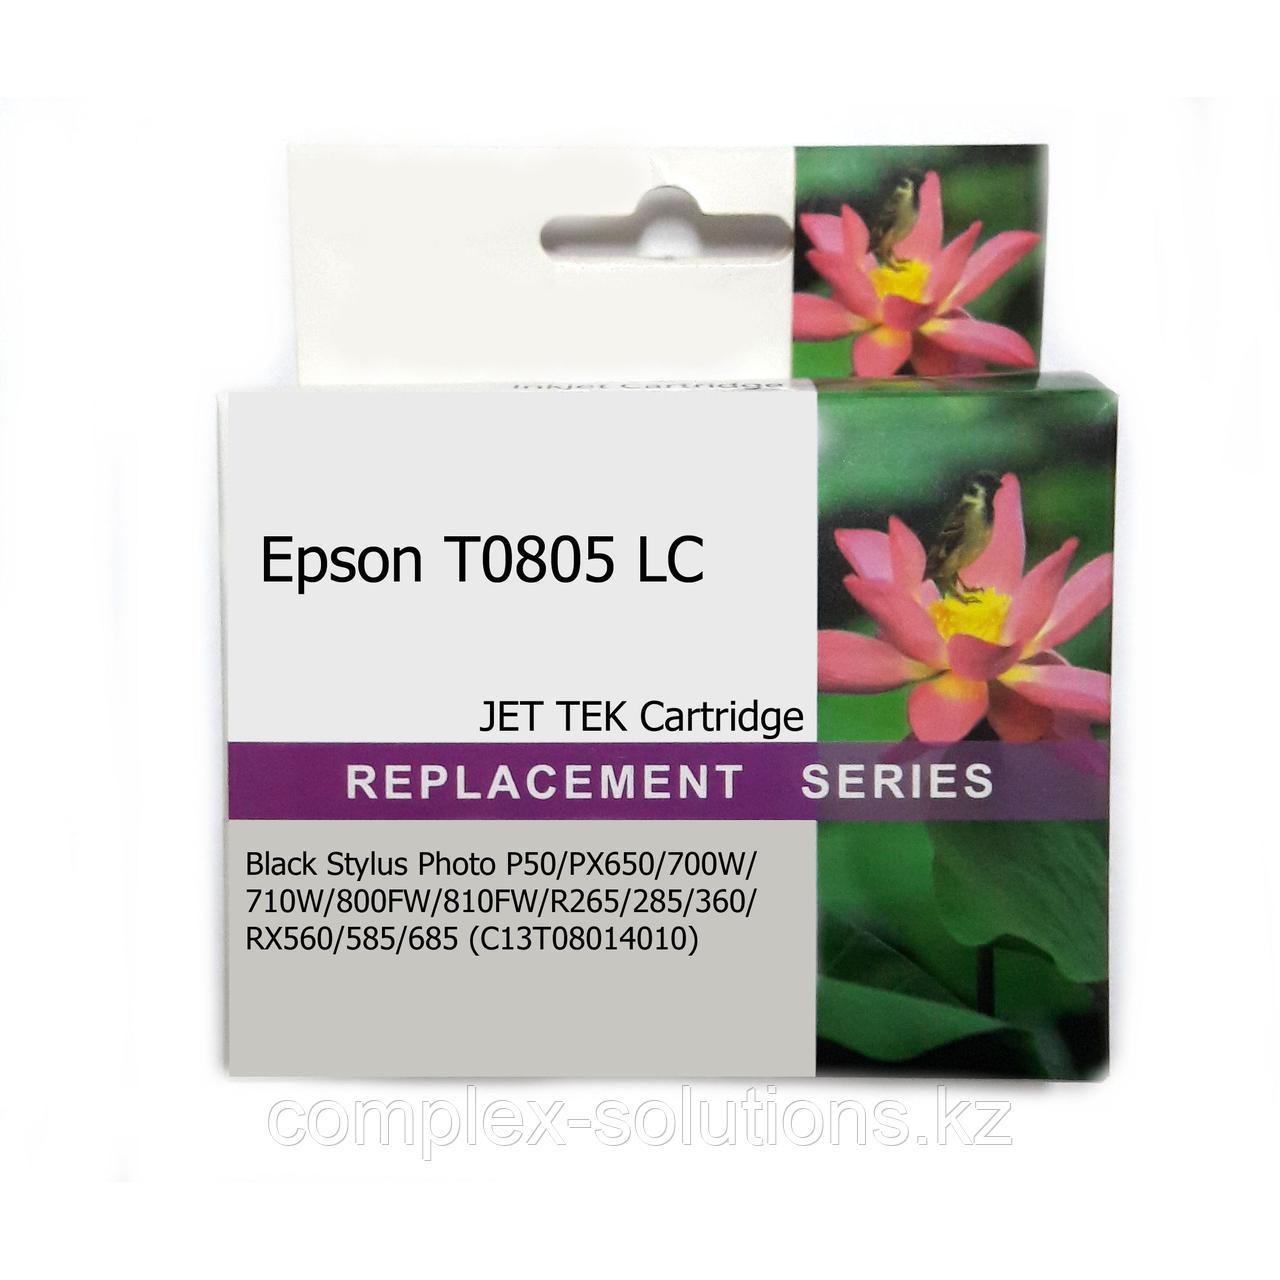 Картридж EPSON T0805 LC JET TEK | [качественный дубликат]